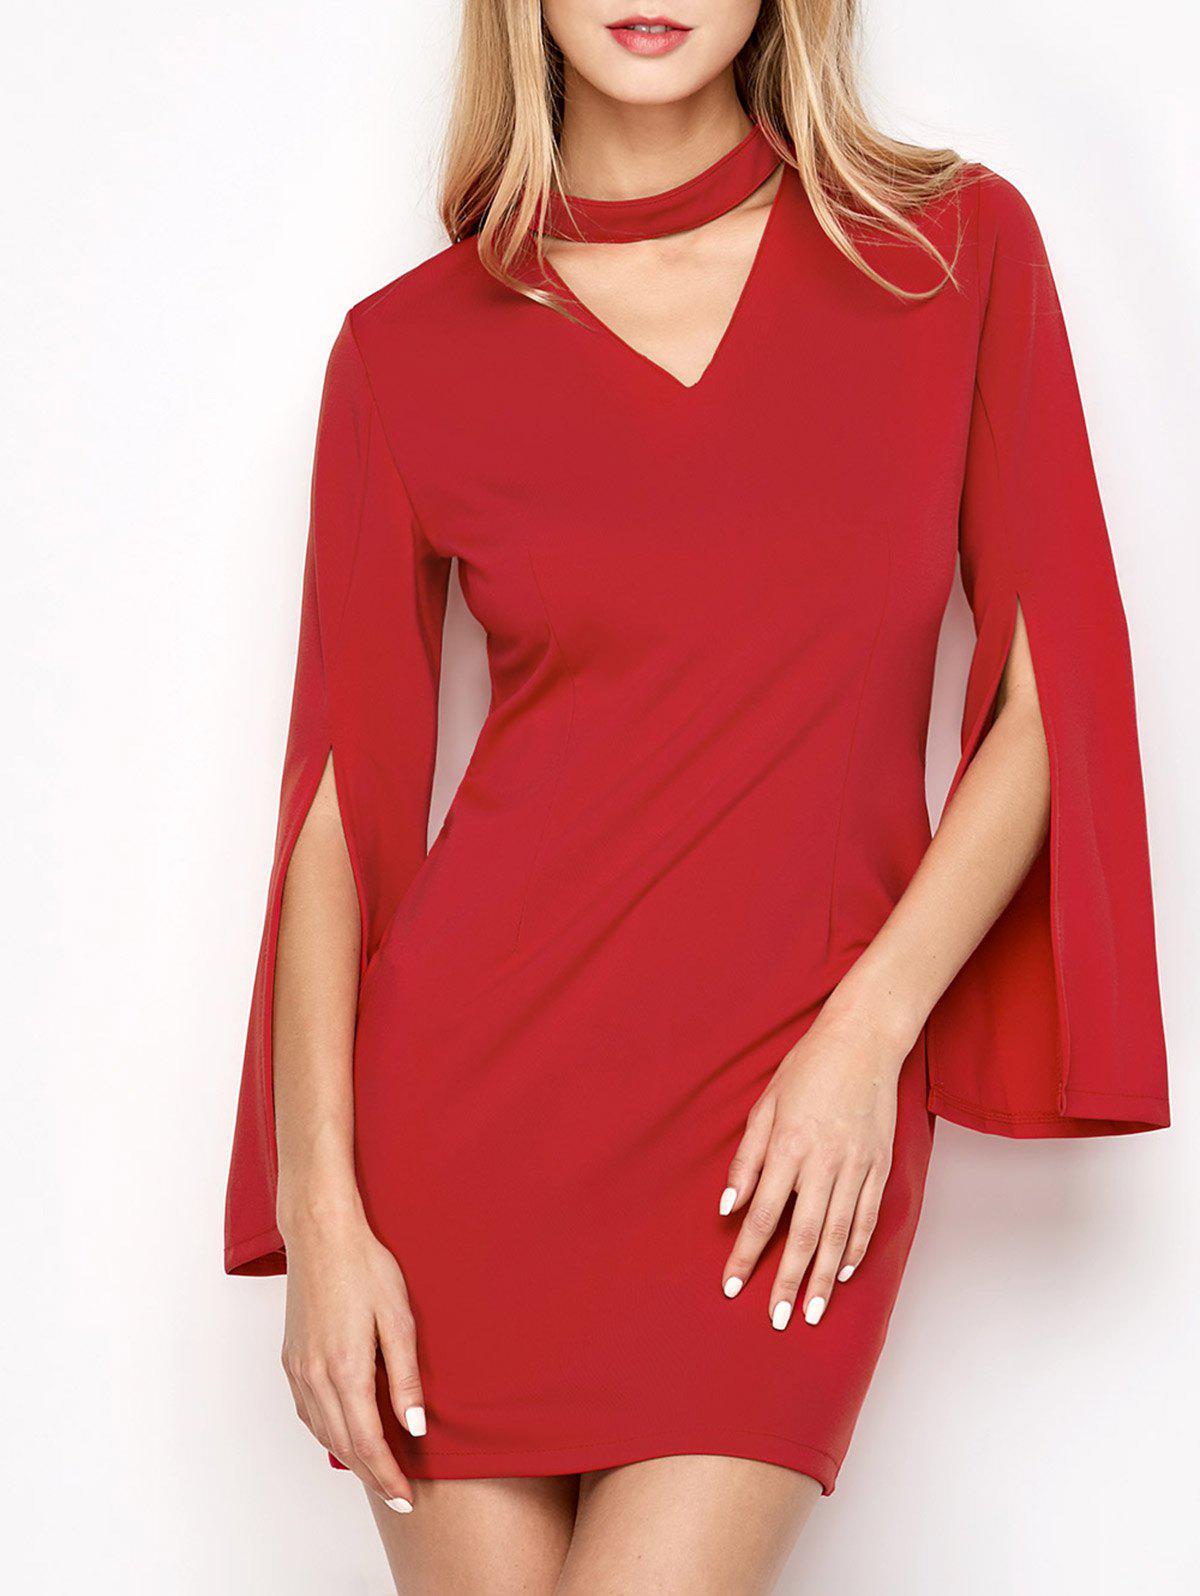 Bell Sleeve Choker Bodycon Dress - Red